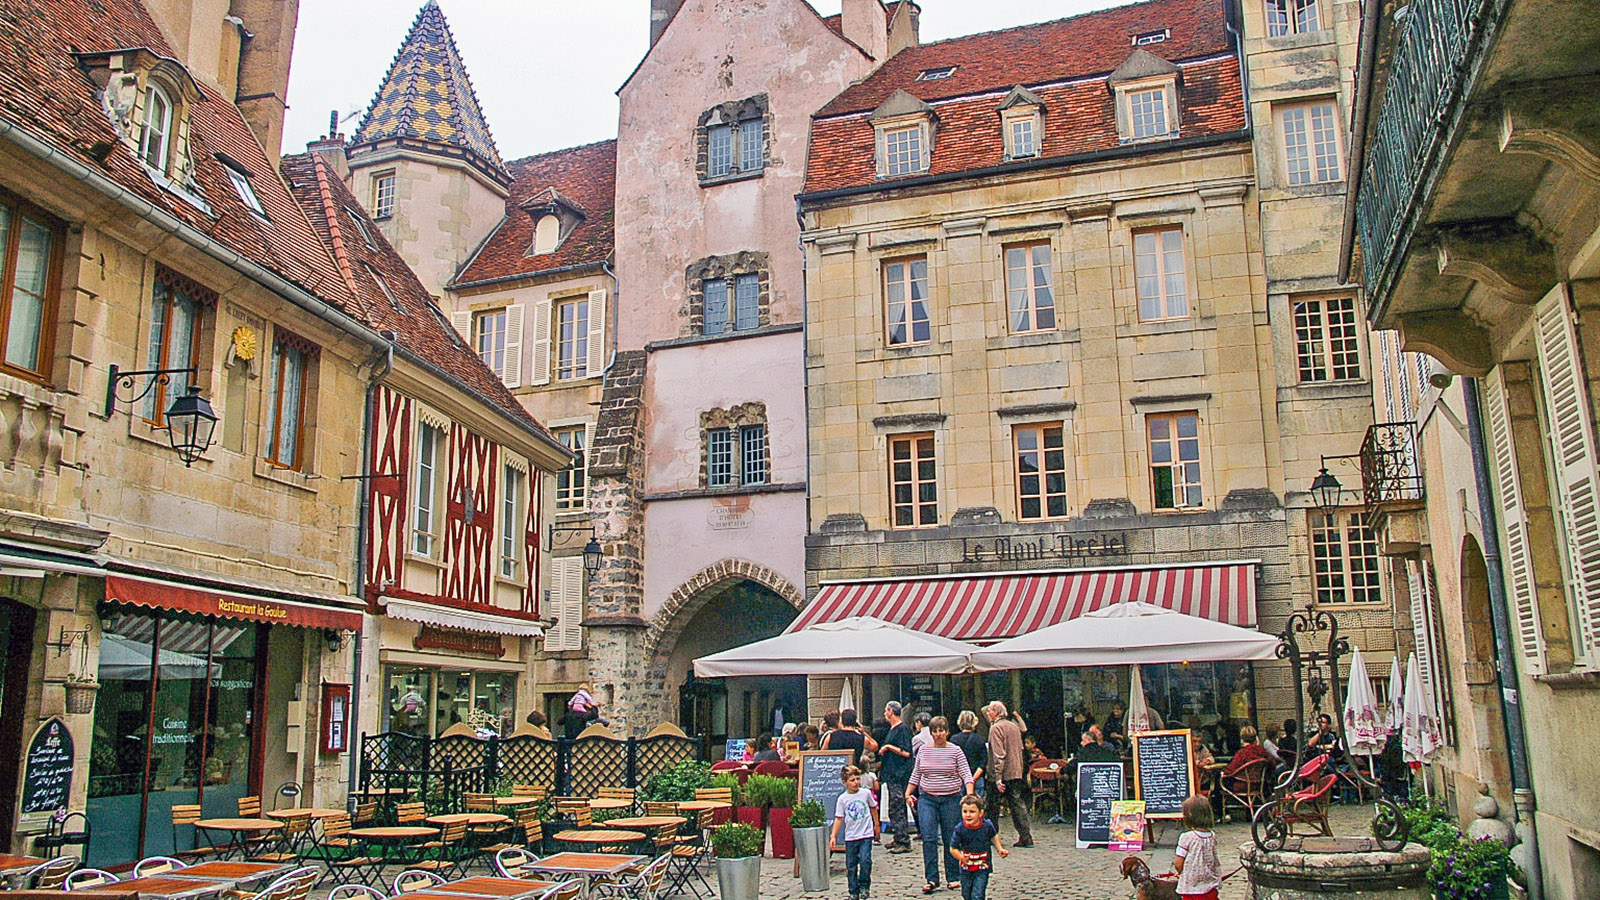 Semur-en-Auxois: Nahe der Porte de Sauvigny findet ihr das Restaurant Le Mont. Foto: Werner Münzel